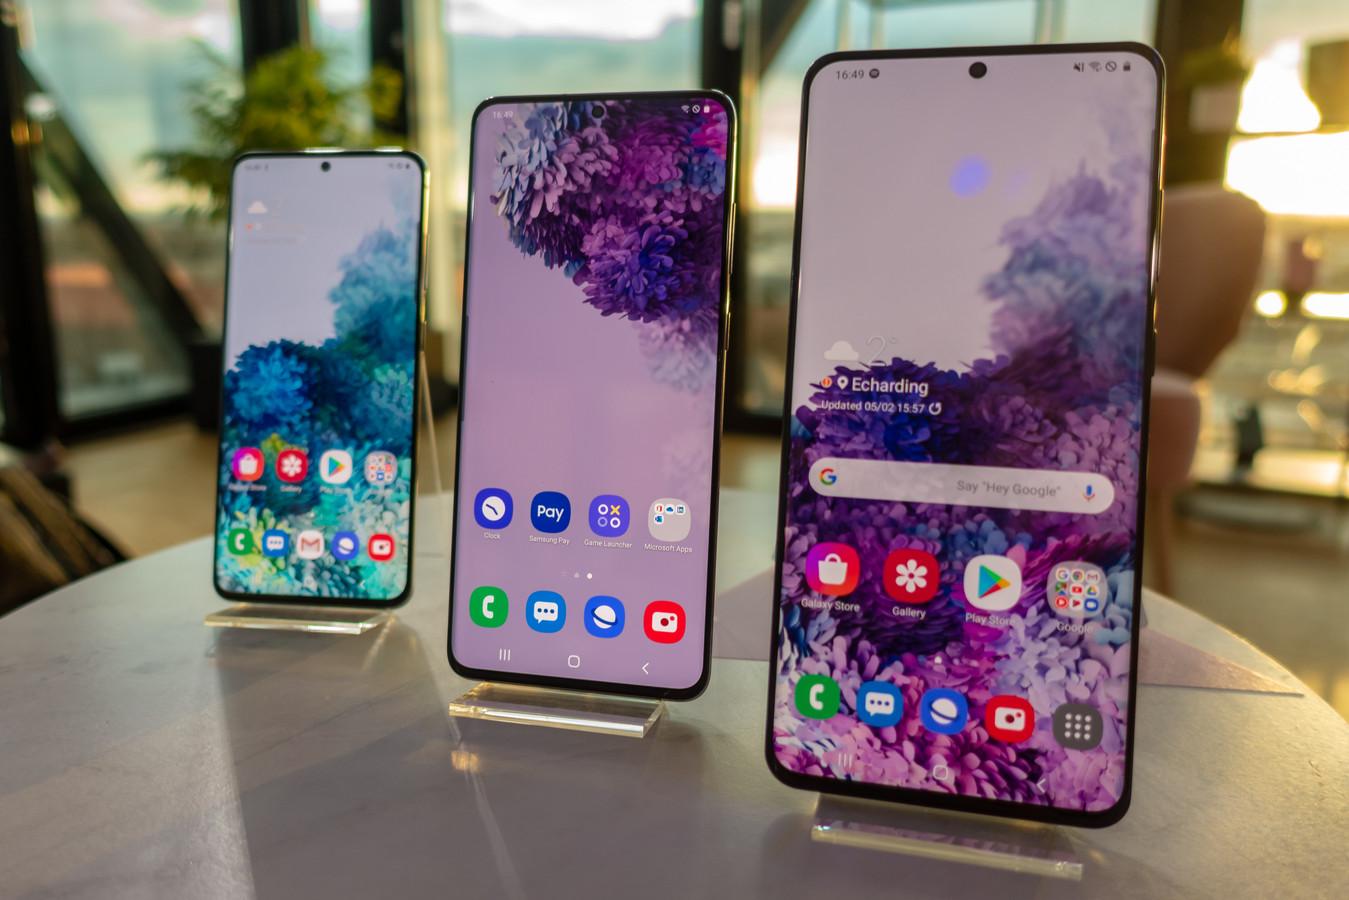 Samsung выпустила One UI 2.5 для Galaxy S20, Galaxy S20+ и Galaxy S20 Ultra: в обновление добавили особенности Galaxy Note 20